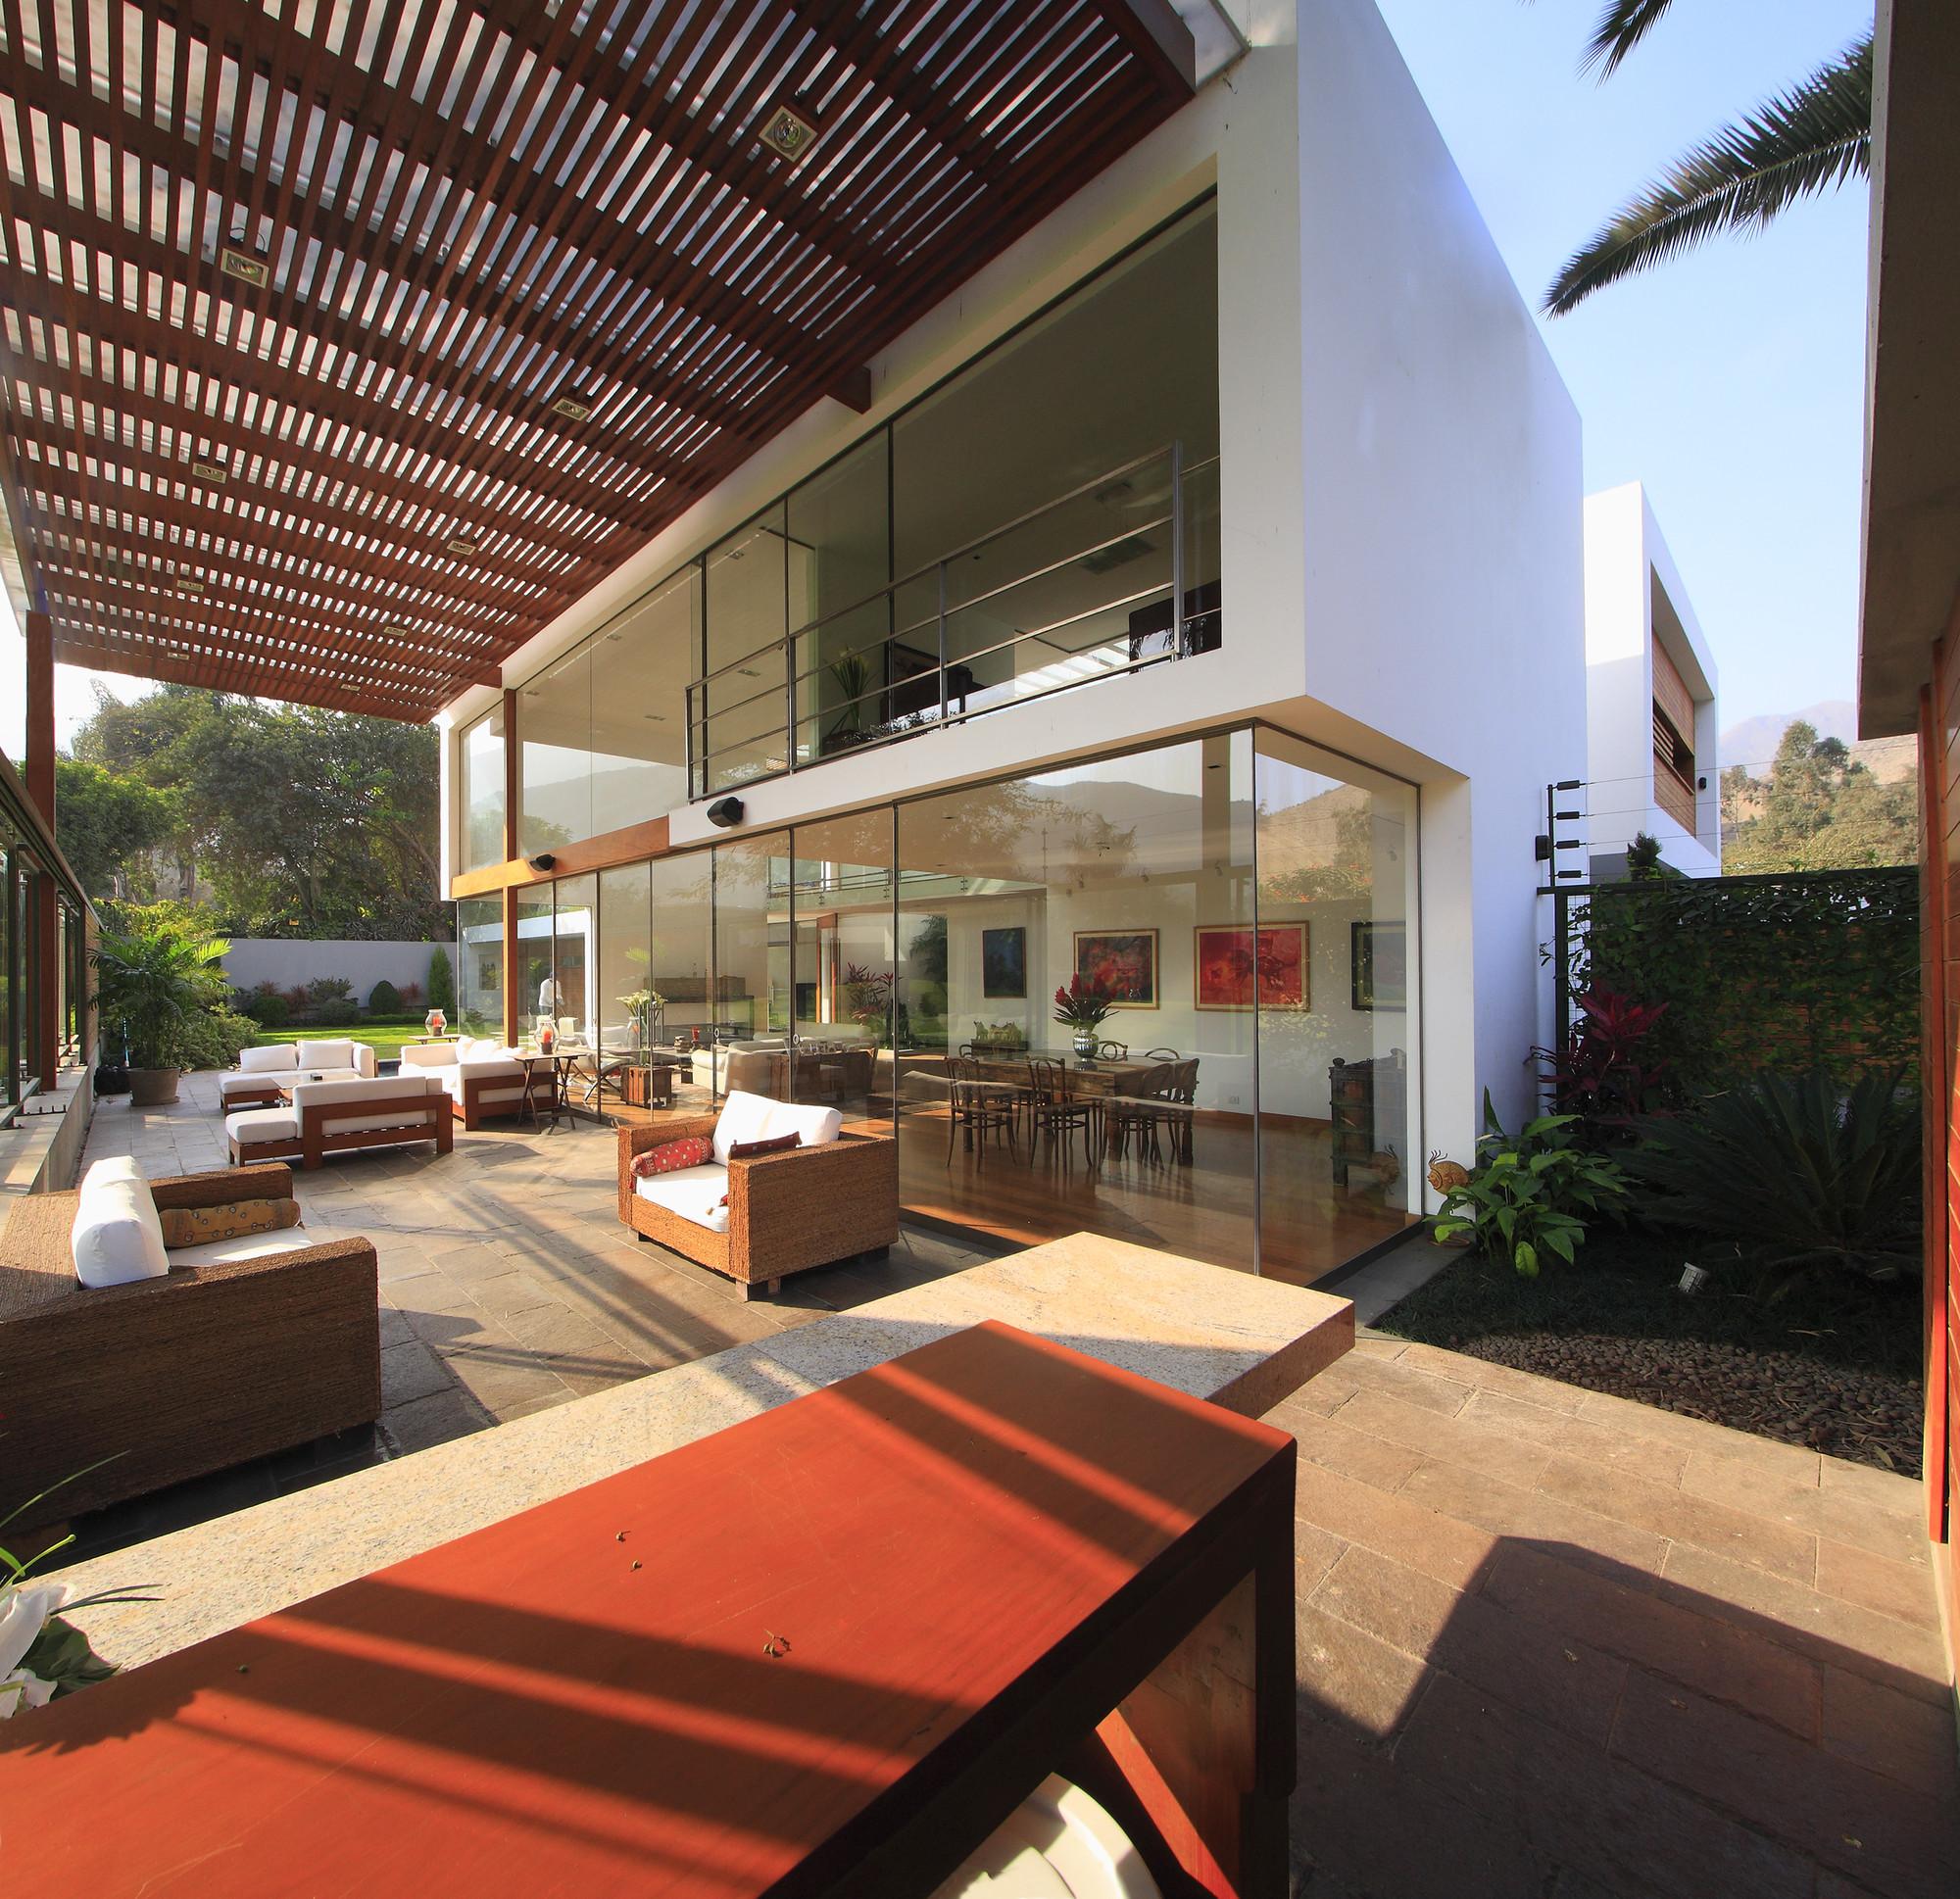 Gallery Of Cachalotes House Oscar Gonzalez Moix 10